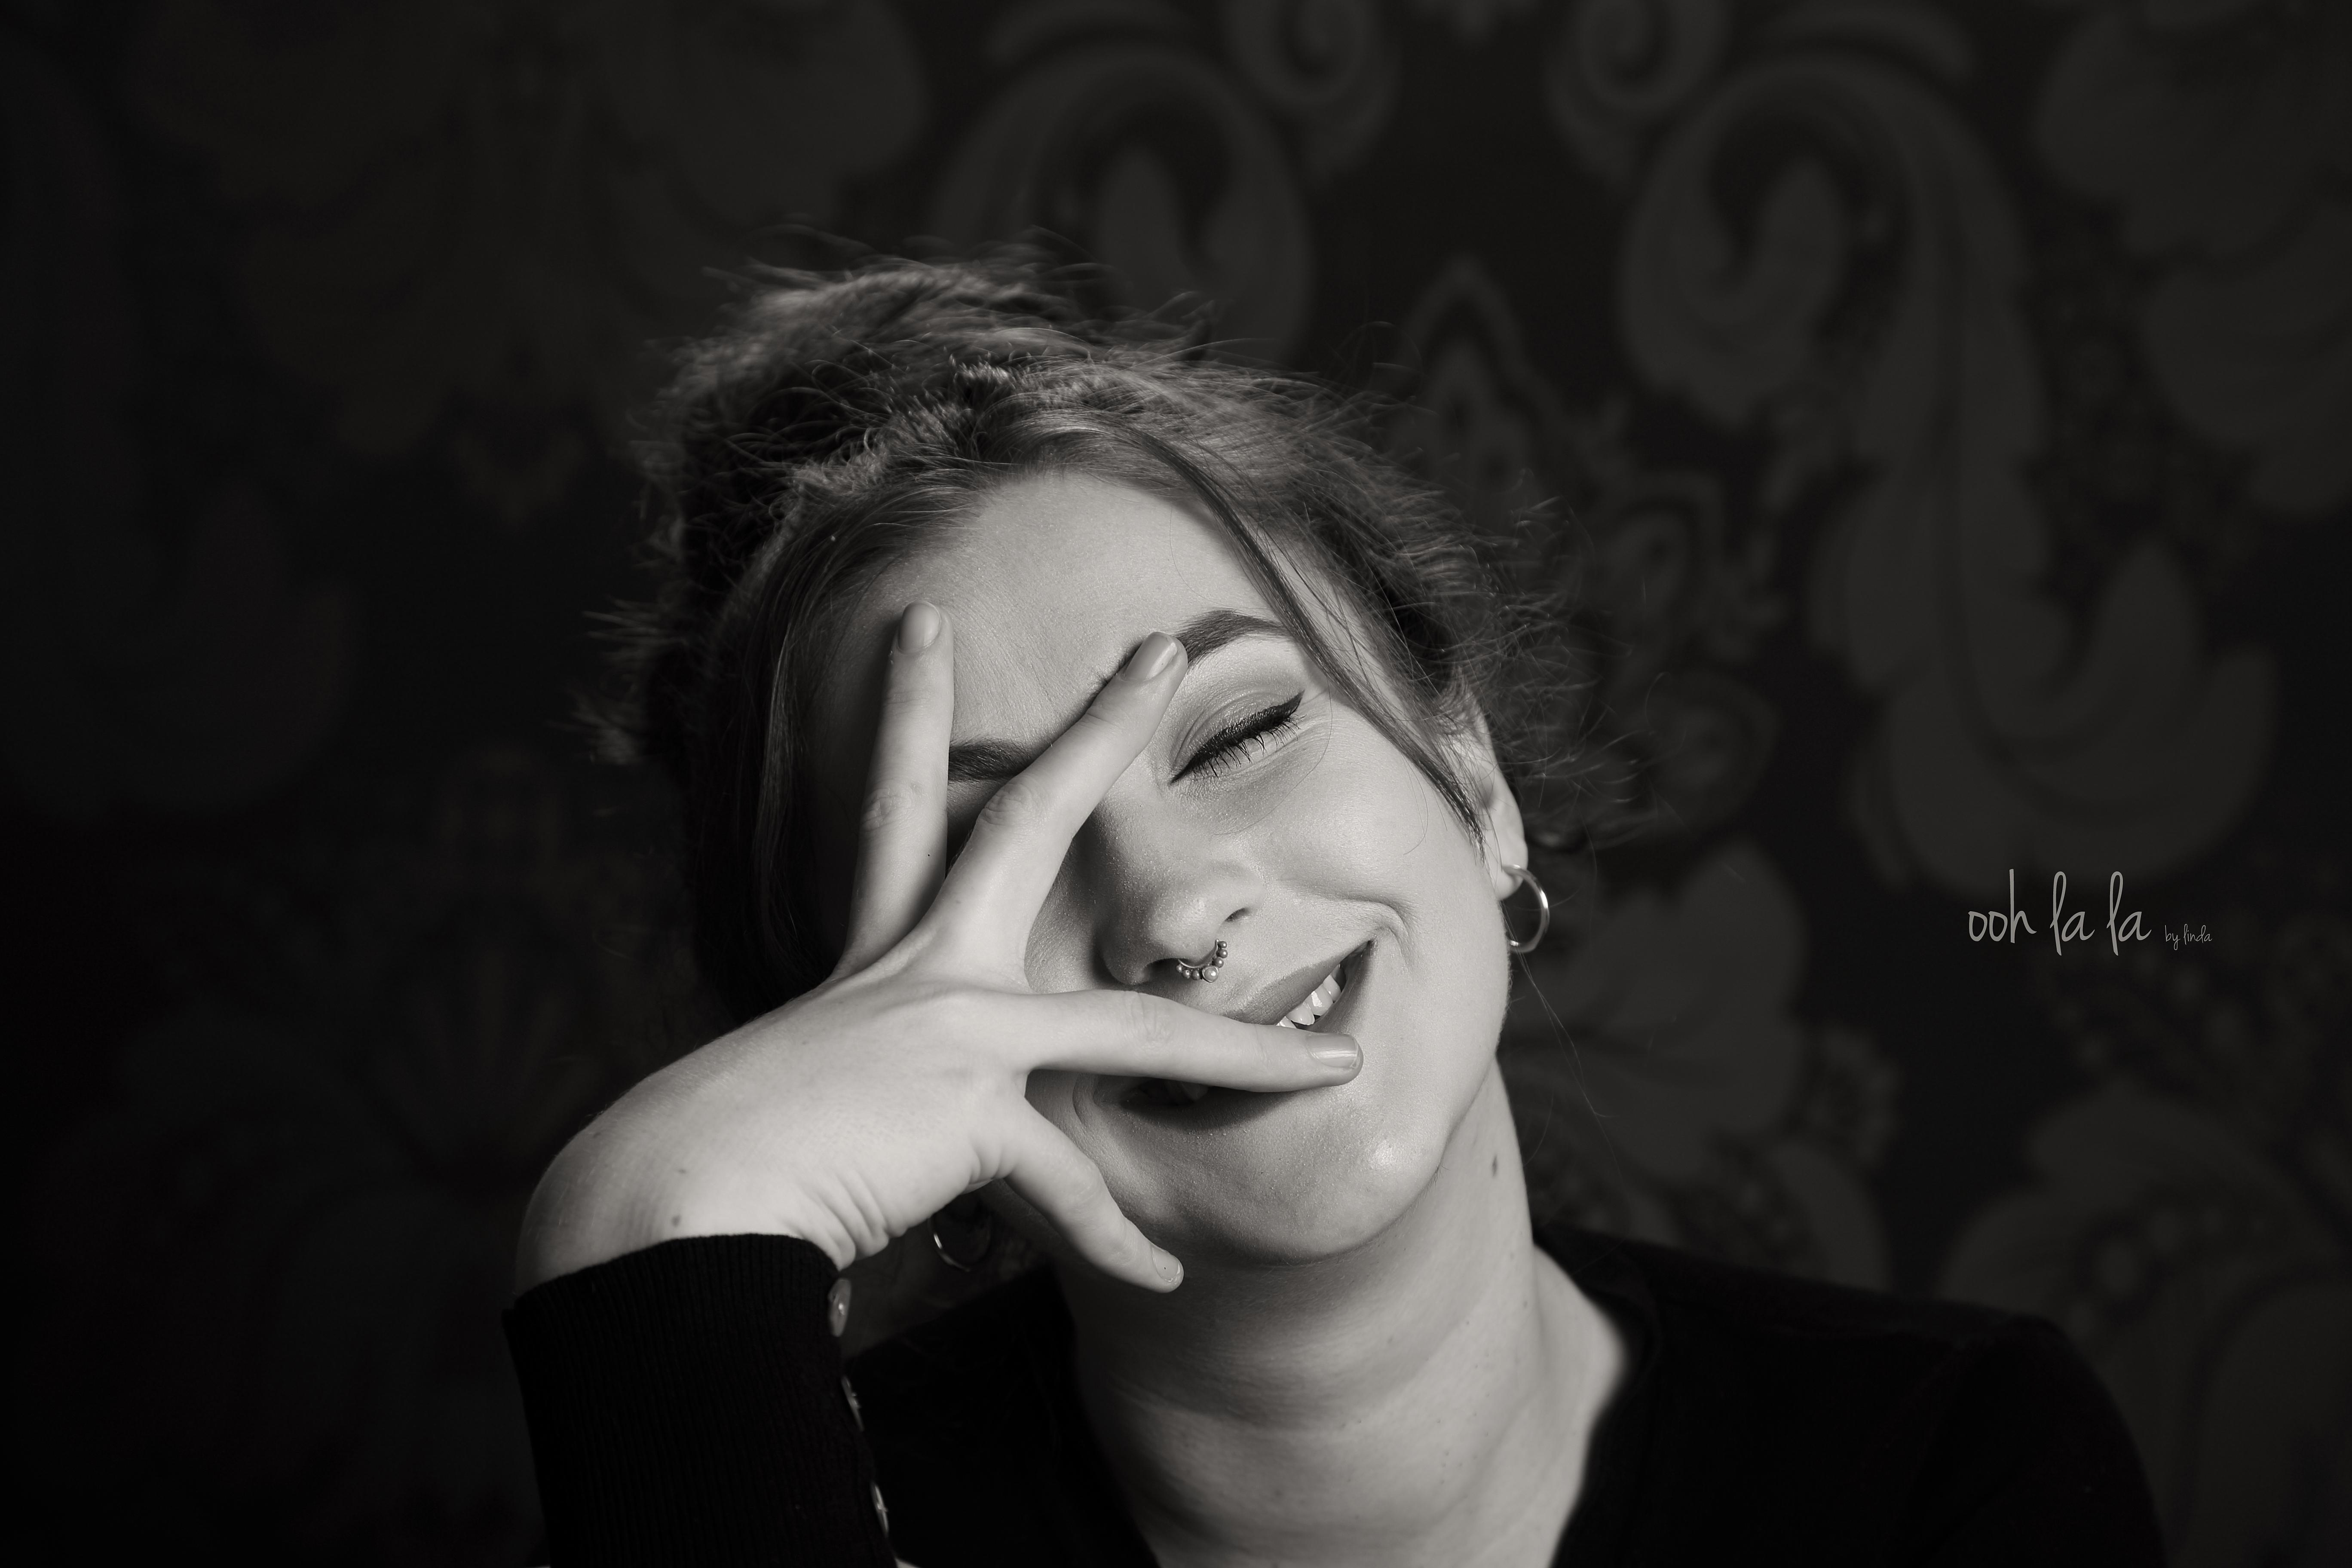 Black and white candid portrait